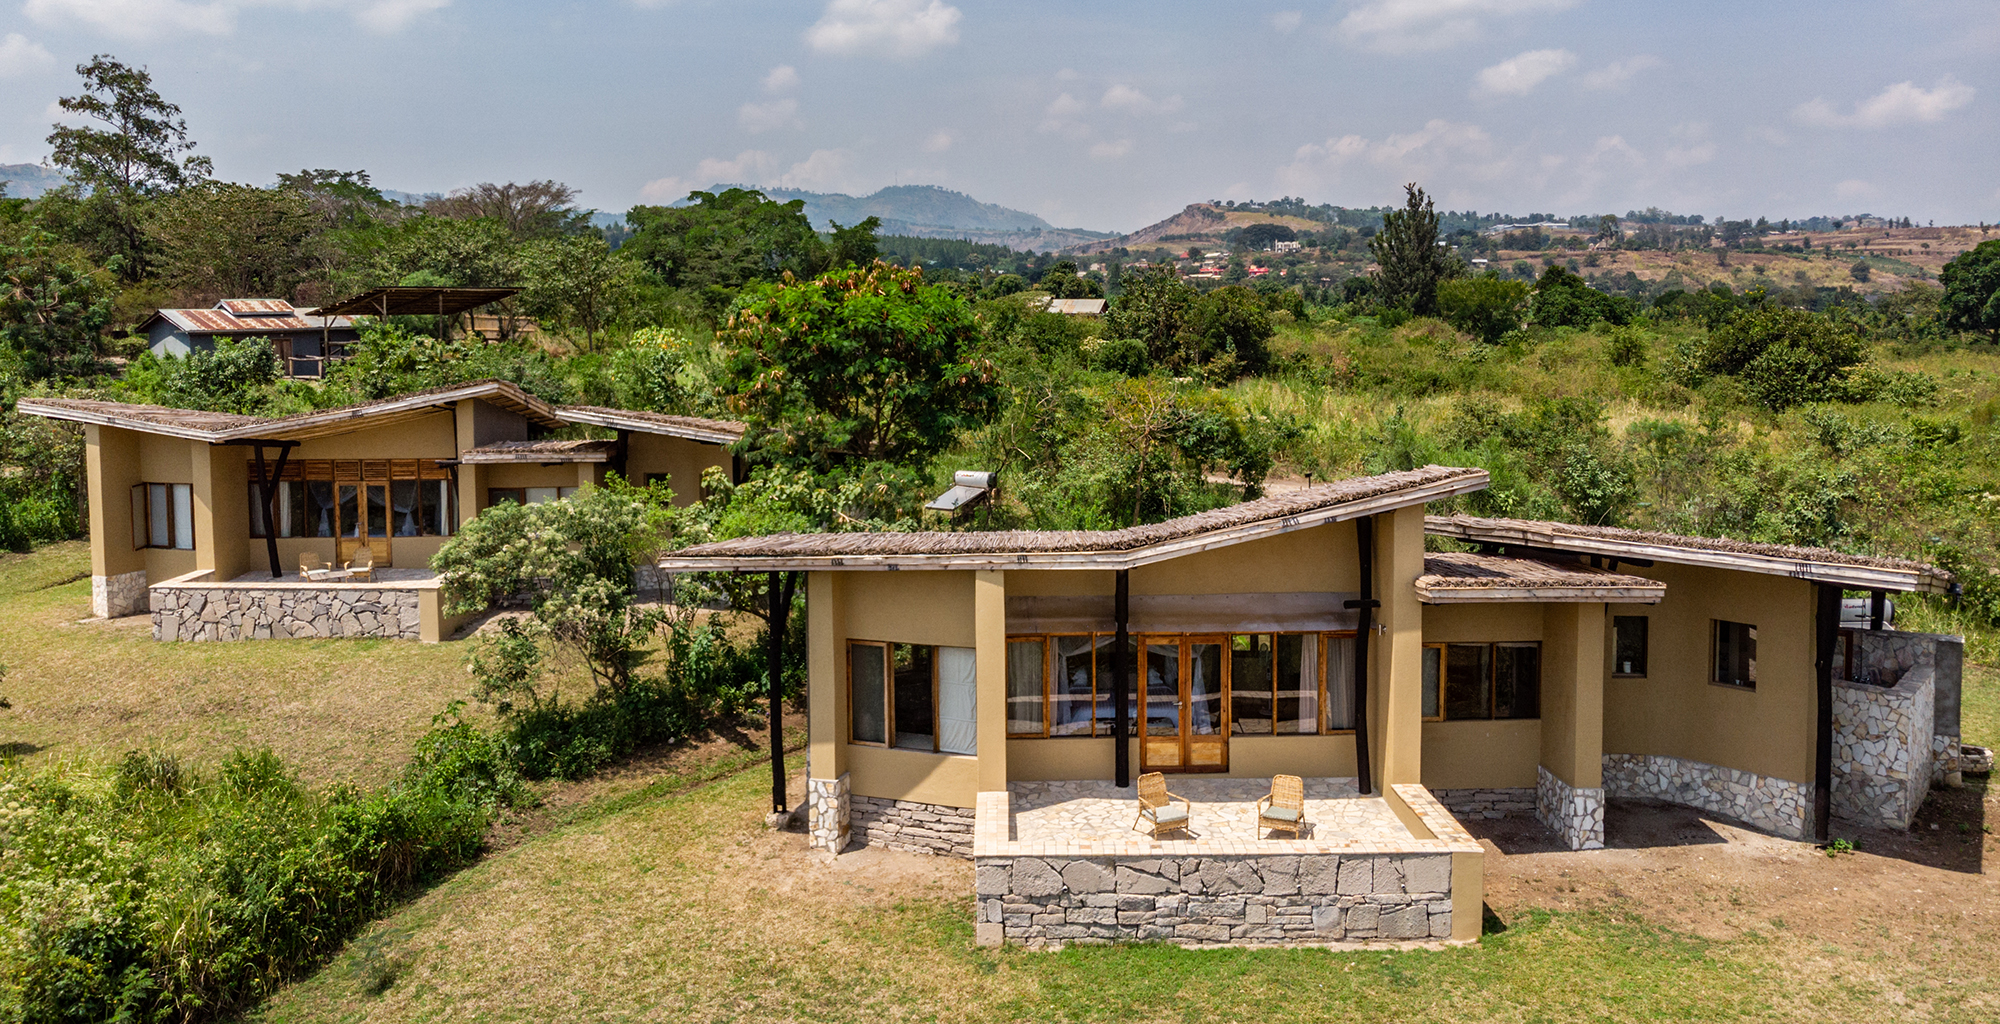 Uganda-Kyambura-Gorge-Exterior